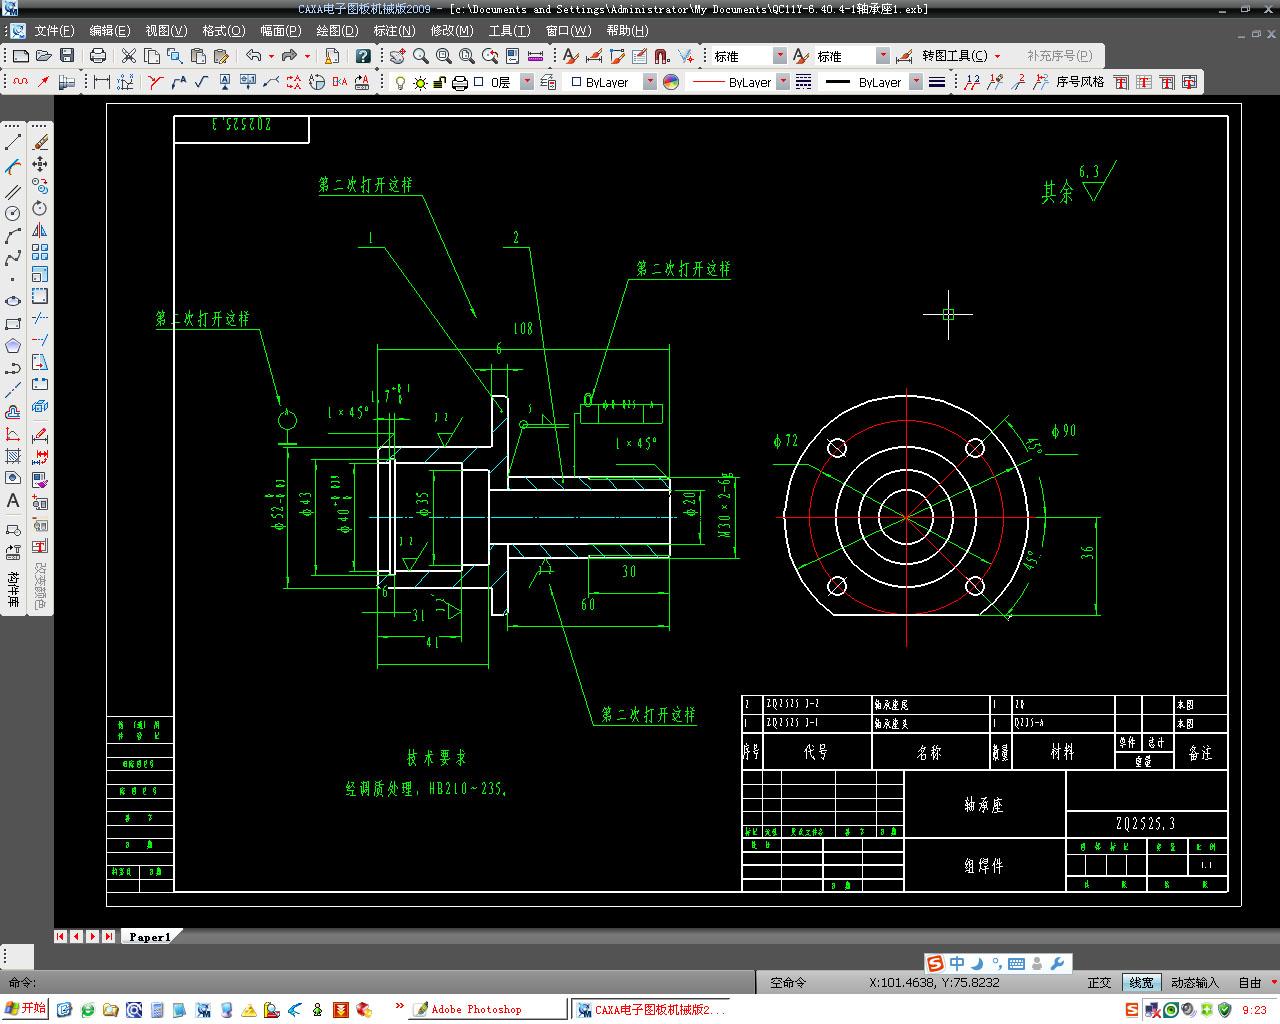 CAD软件技术竞赛交流区CAXA2009标准版不建筑cad机械学习评分图片